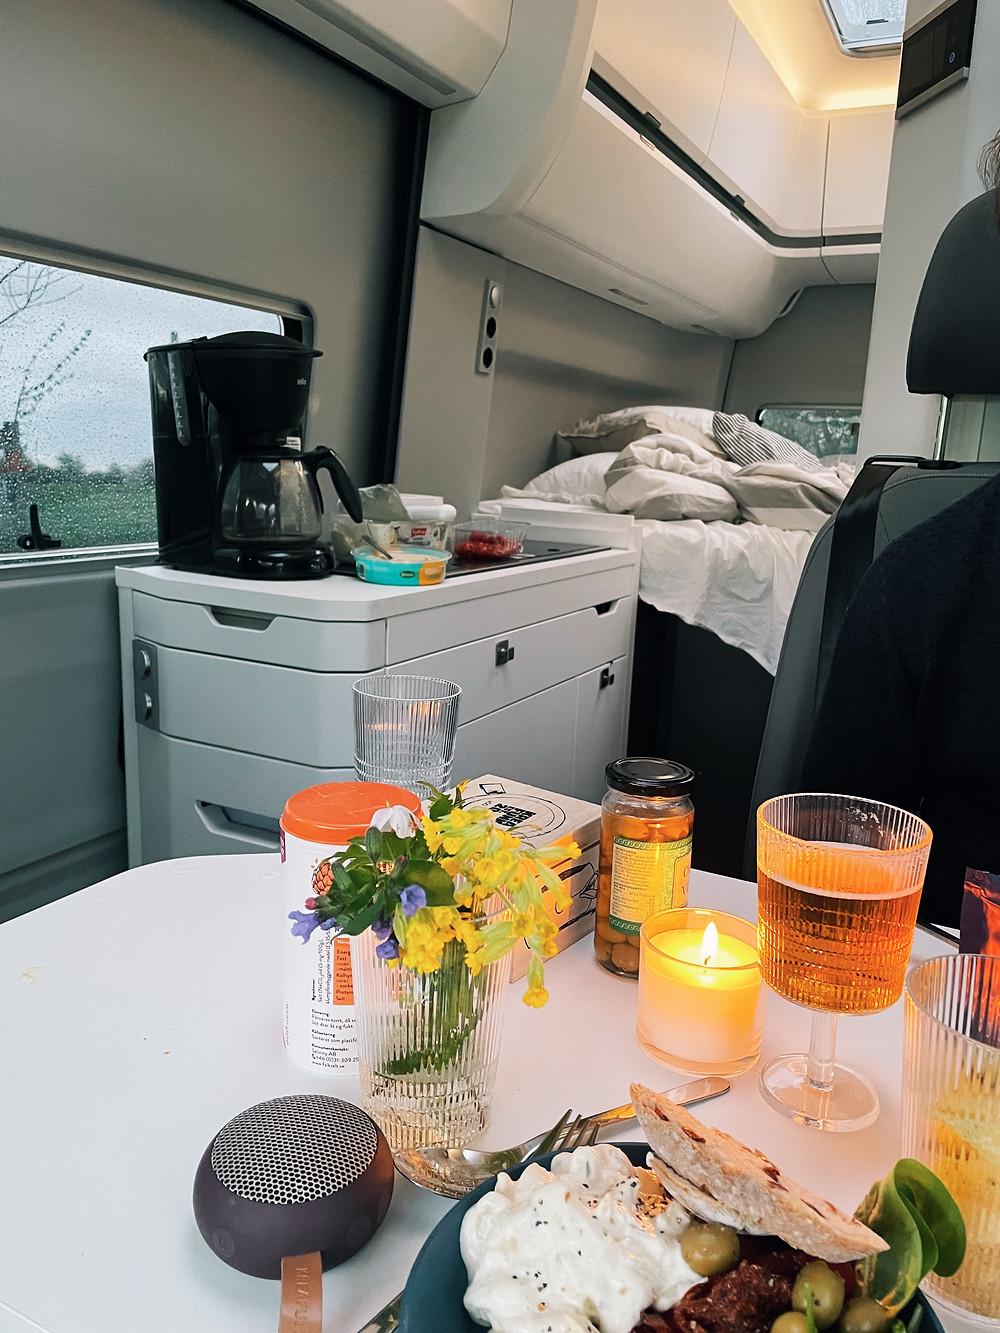 Middag vid matplatsen i campingbilen VW Grand California som hyrs ut av Europcar.